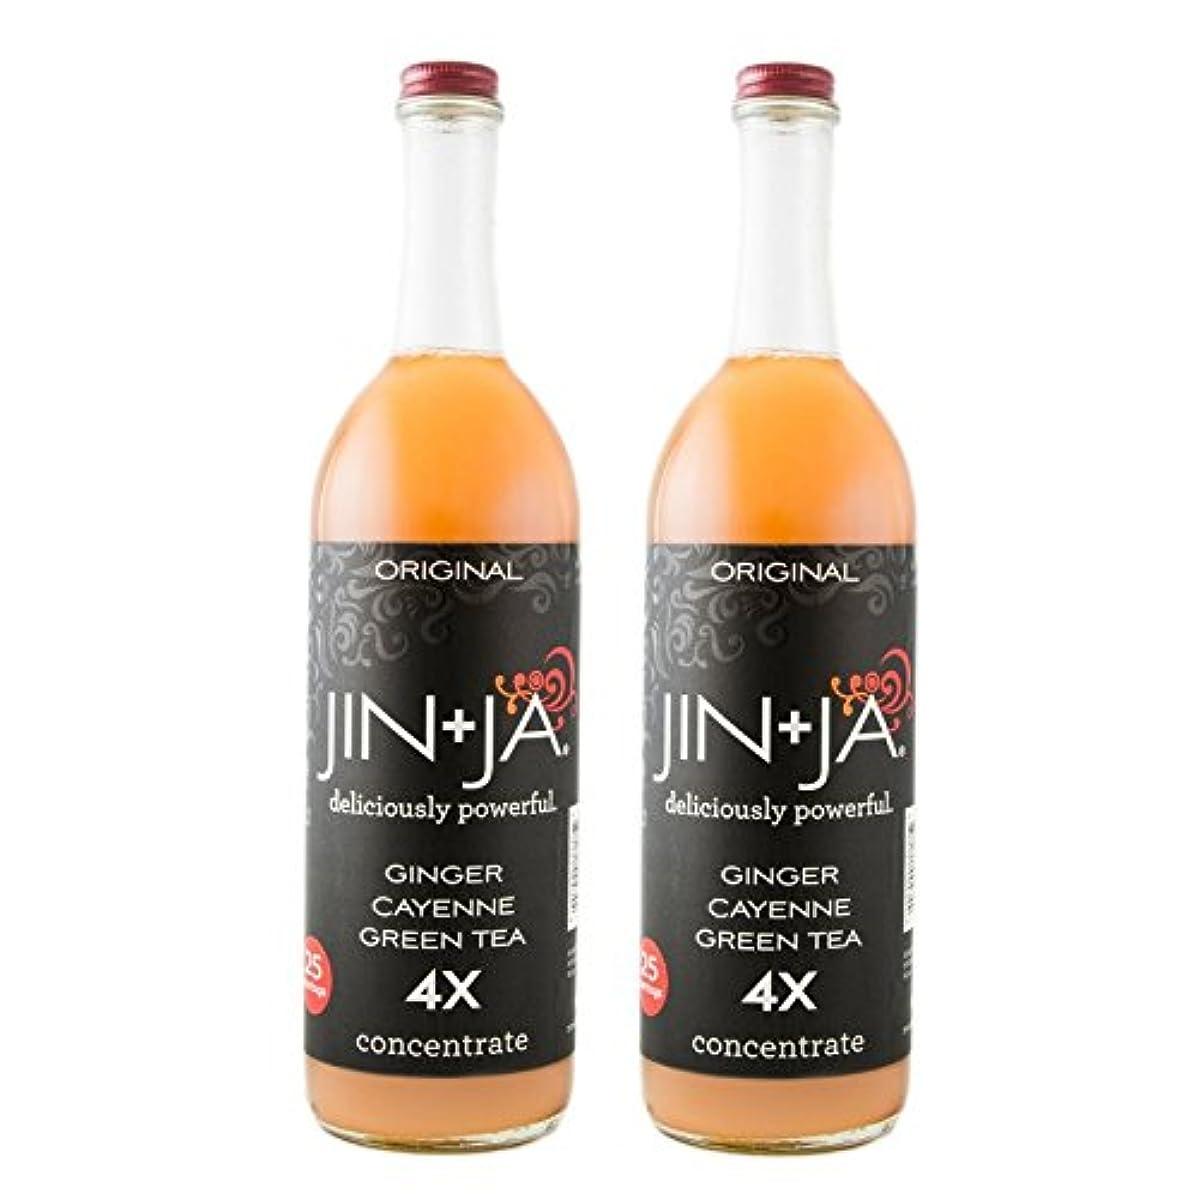 JinJa Original Fresh Ginger Green Tea Drink in 4x Concentrate - 750ml, 2 Pack